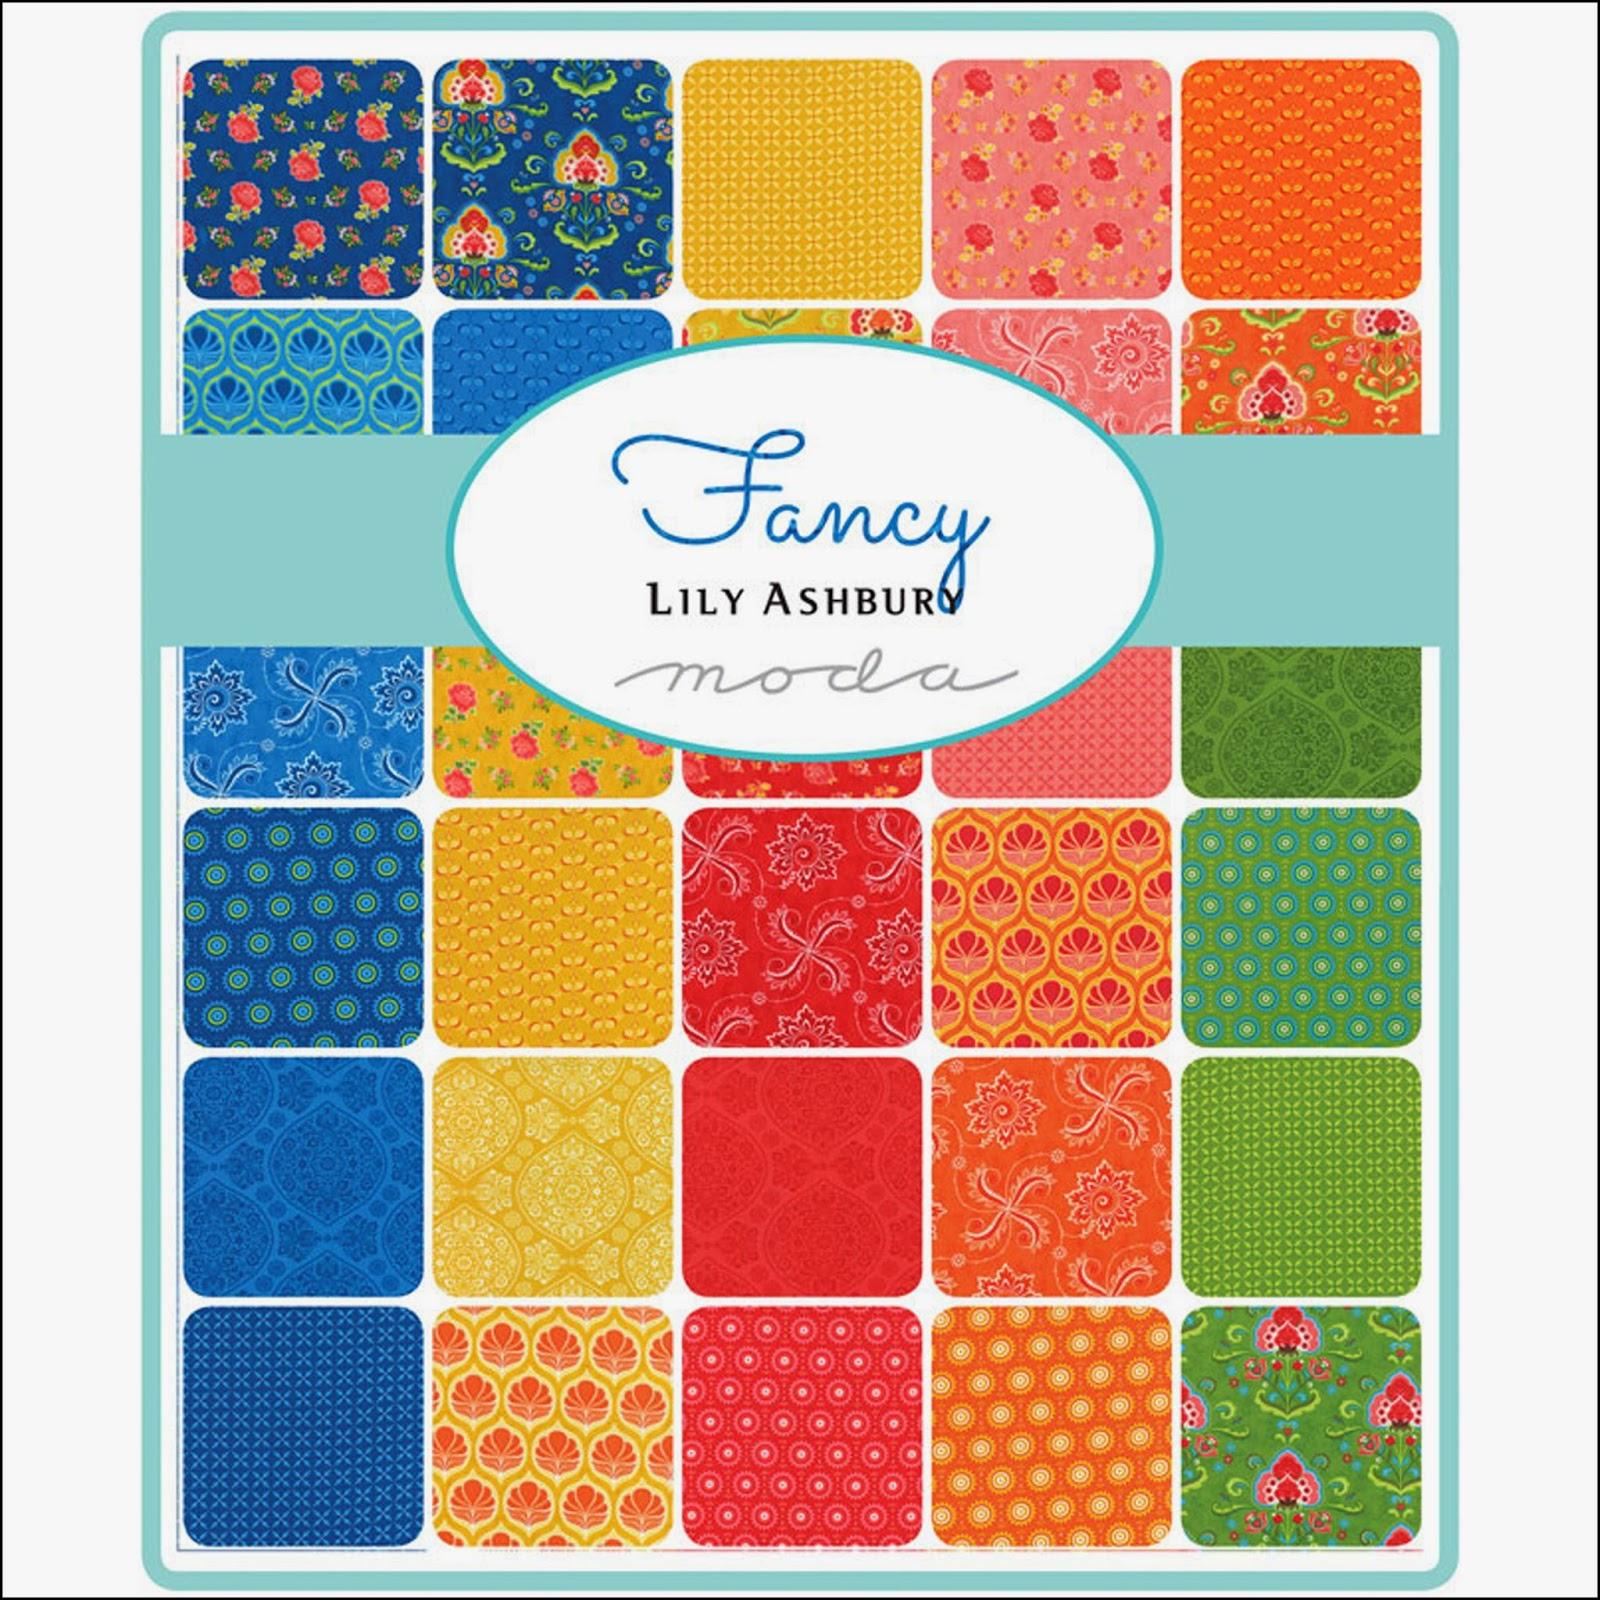 Moda FANCY Quilt Fabric by Lily Ashbury for Moda Fabrics